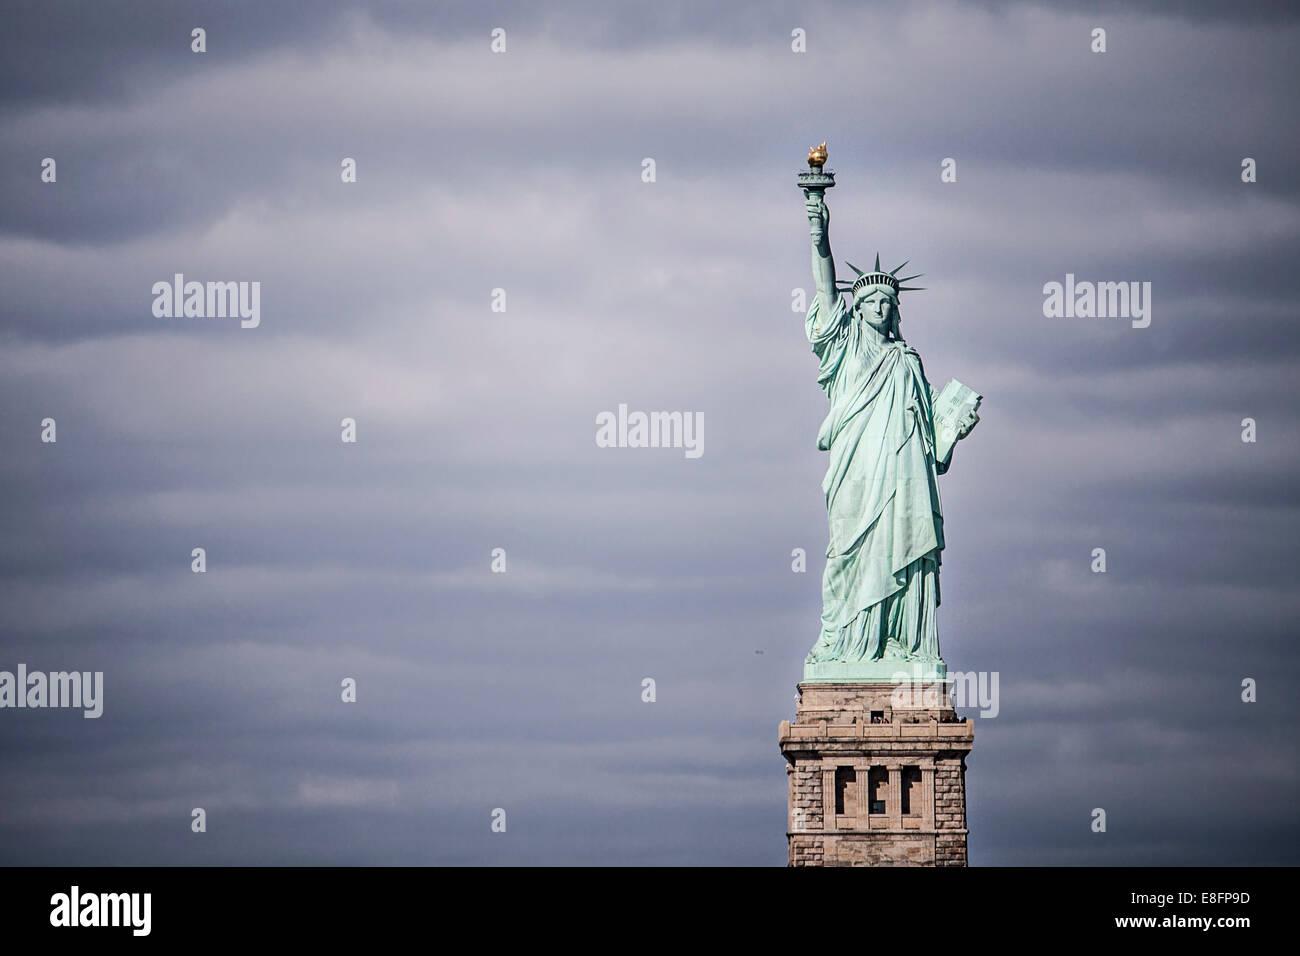 Statue Of Liberty, New York, Amerika, USA Stockbild